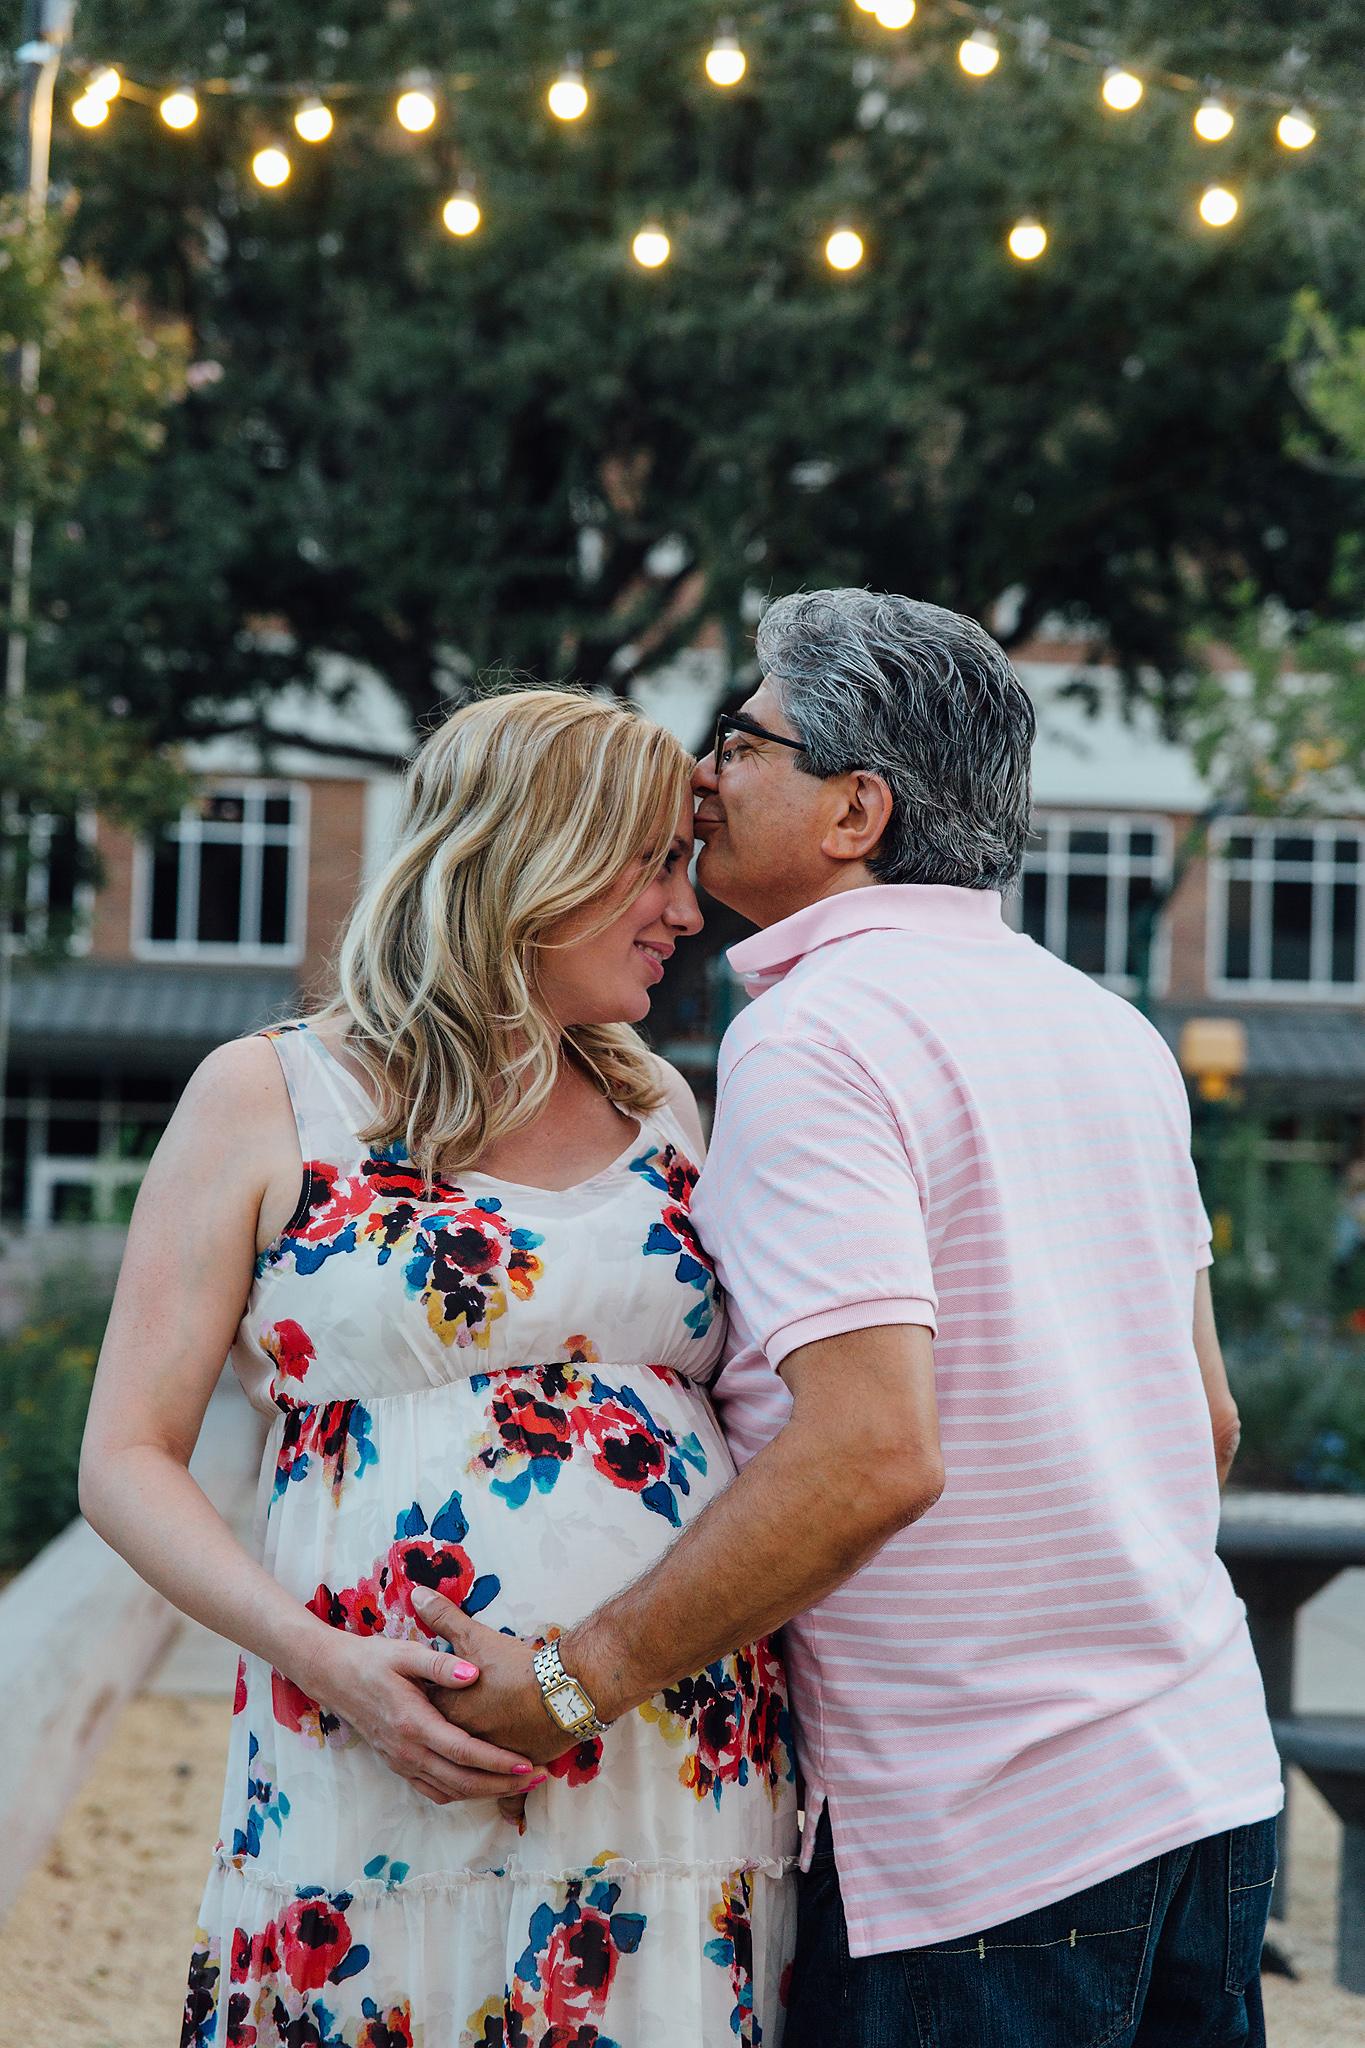 el-paso-maternity-photographer-3.jpg